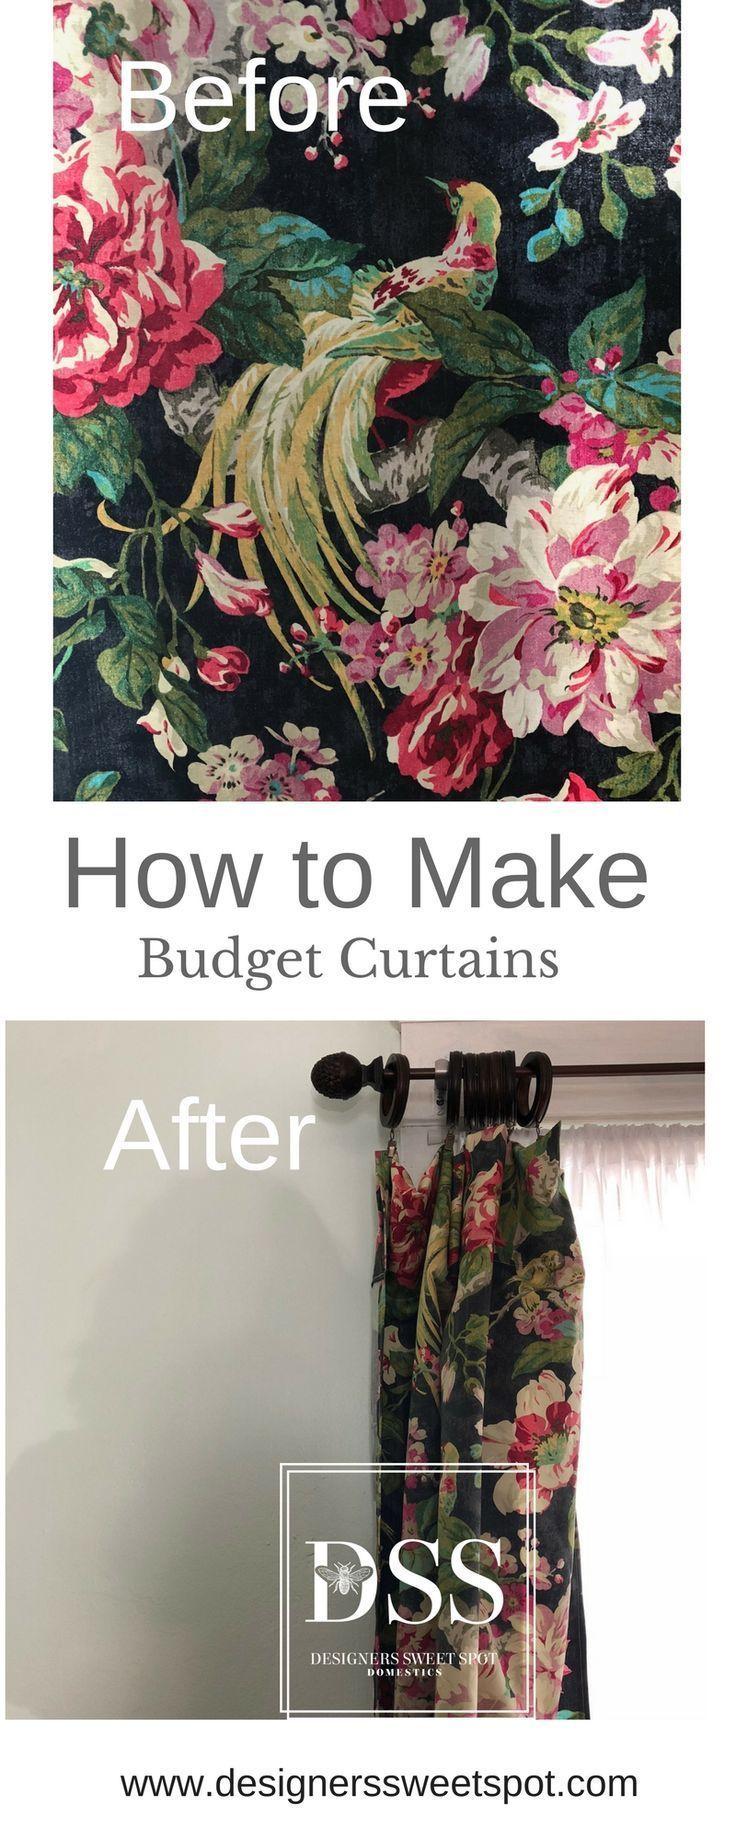 How to Make Budget Curtains|Designers Sweet Spot|www.designerssweetspot.com